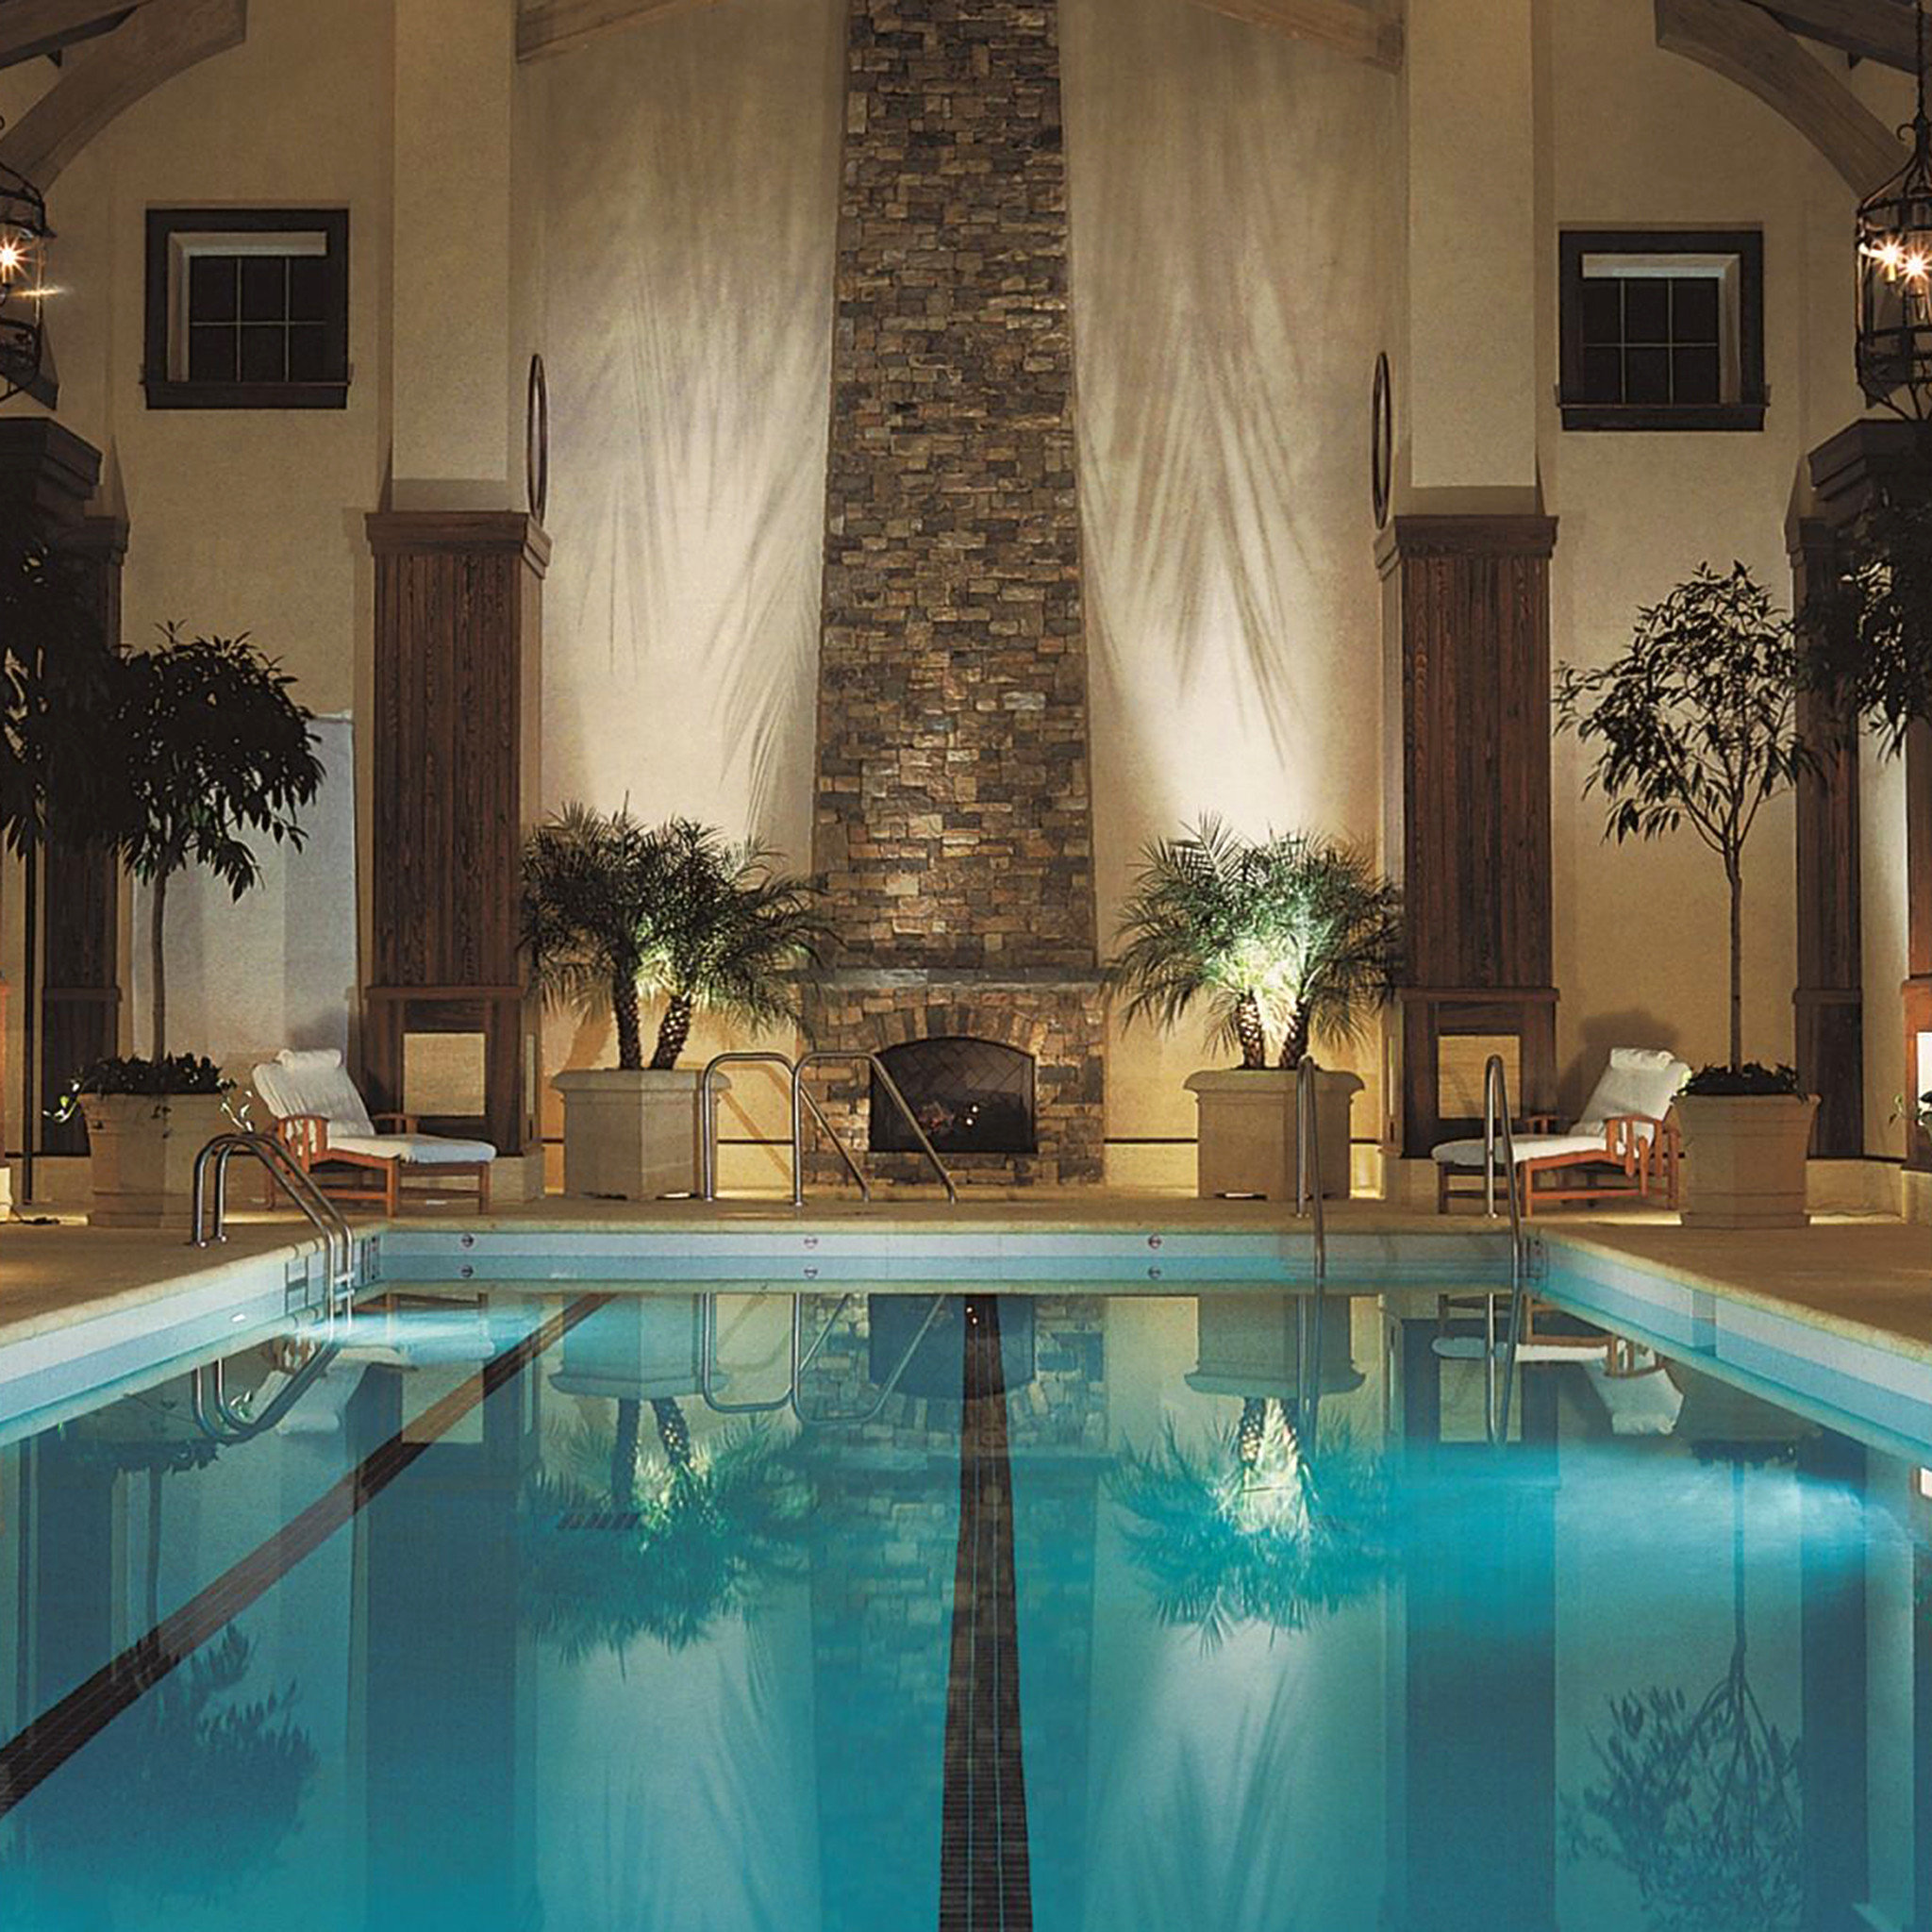 Hotels Lakes + Rivers Lounge Luxury Modern Pool Romance Trip Ideas swimming pool indoor property estate mansion interior design Villa Resort altar